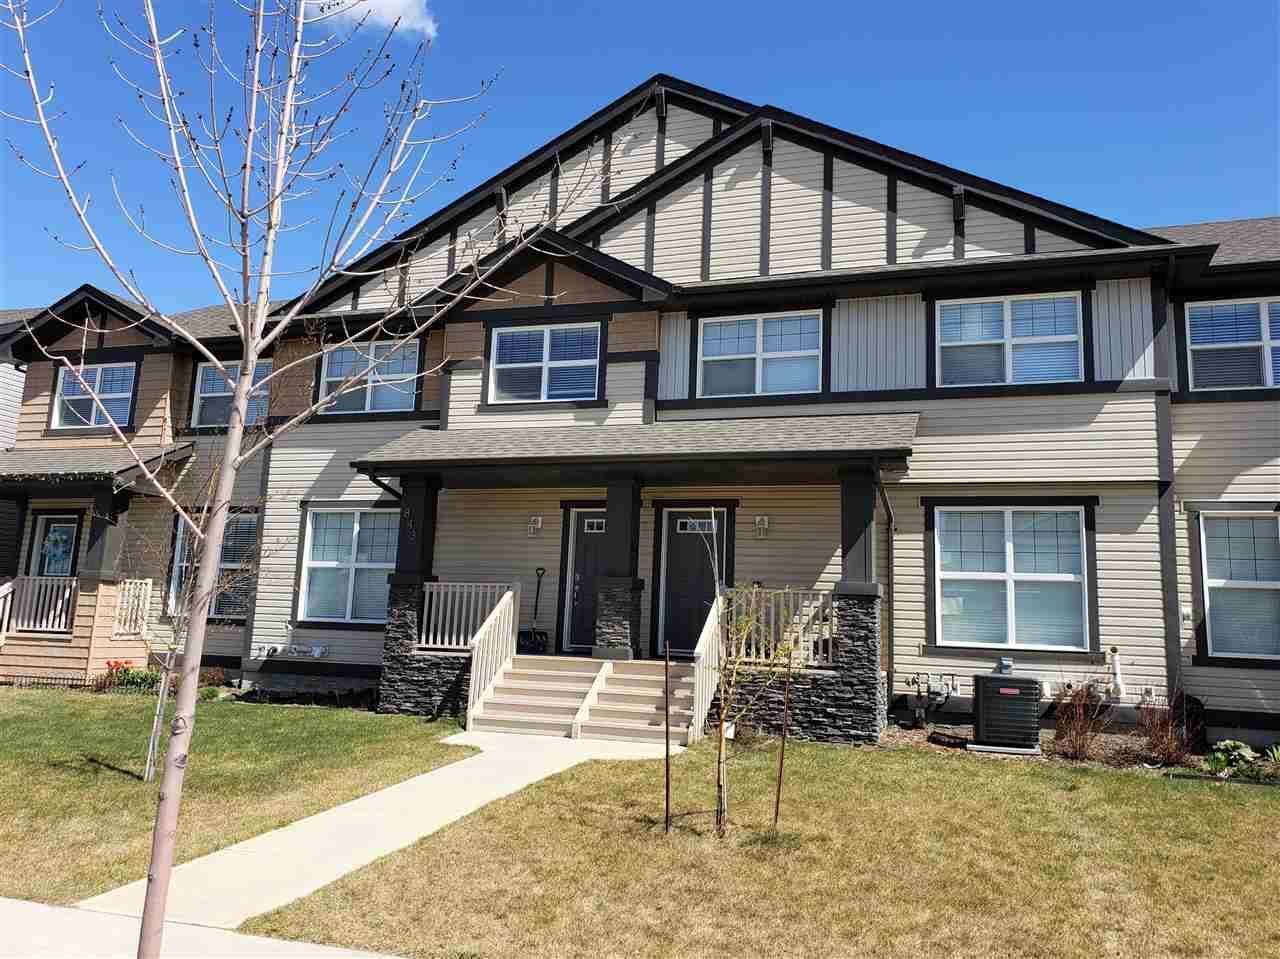 House for sale at 843 Crystallina Nera Wy Nw Edmonton Alberta - MLS: E4157300